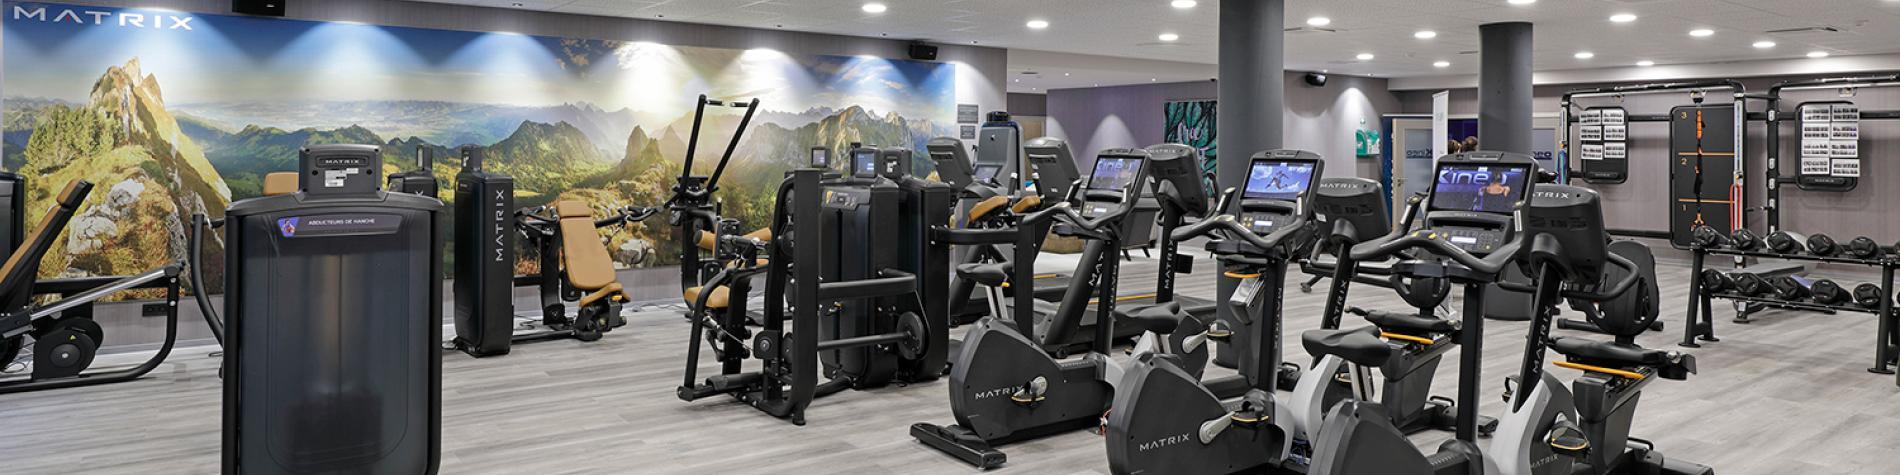 Salle fitness de l'hôtel Van der Valk Nivelles Sud